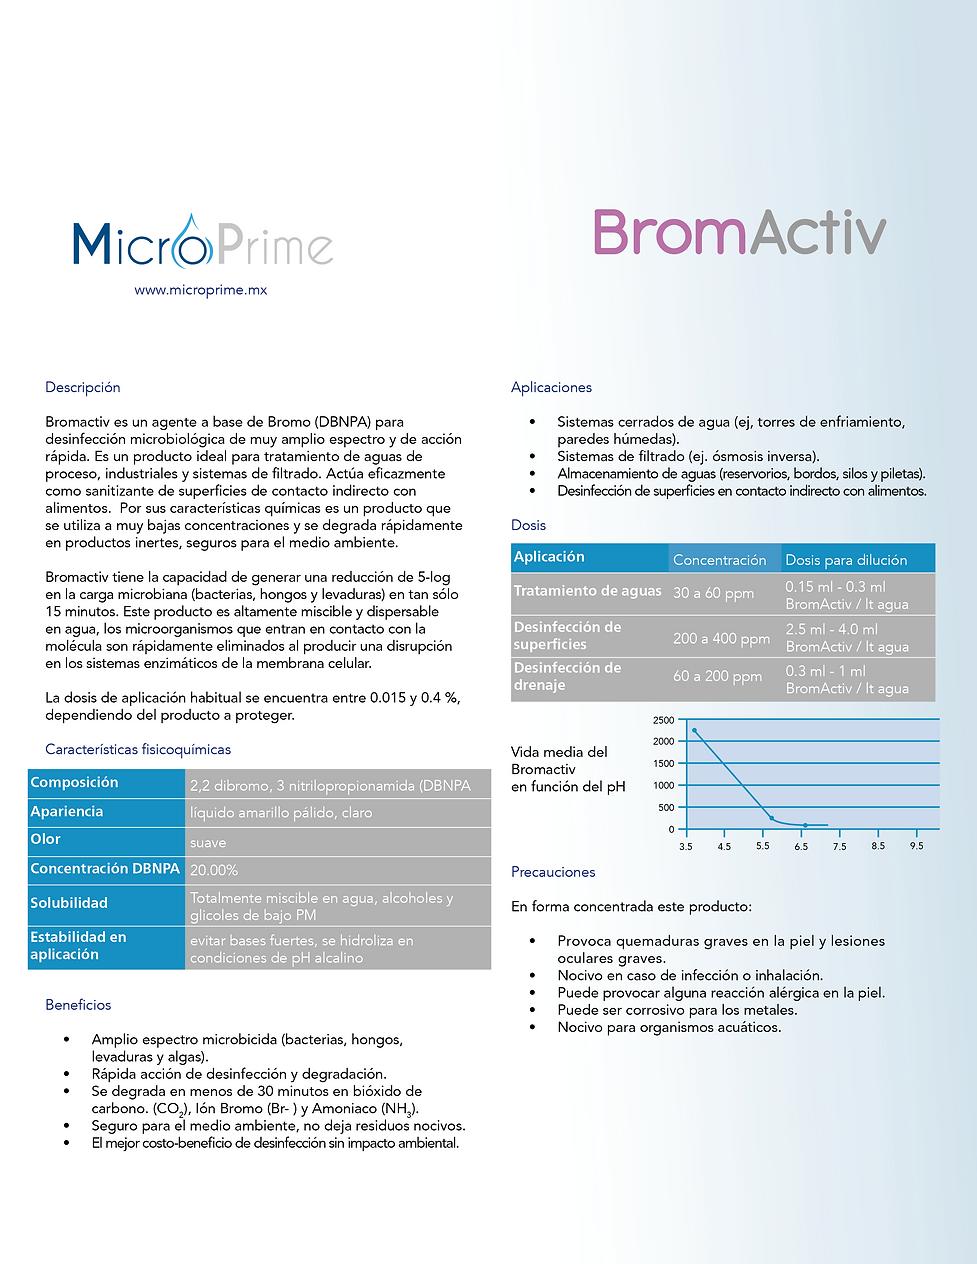 FT_BromActiv-2020 (1).png